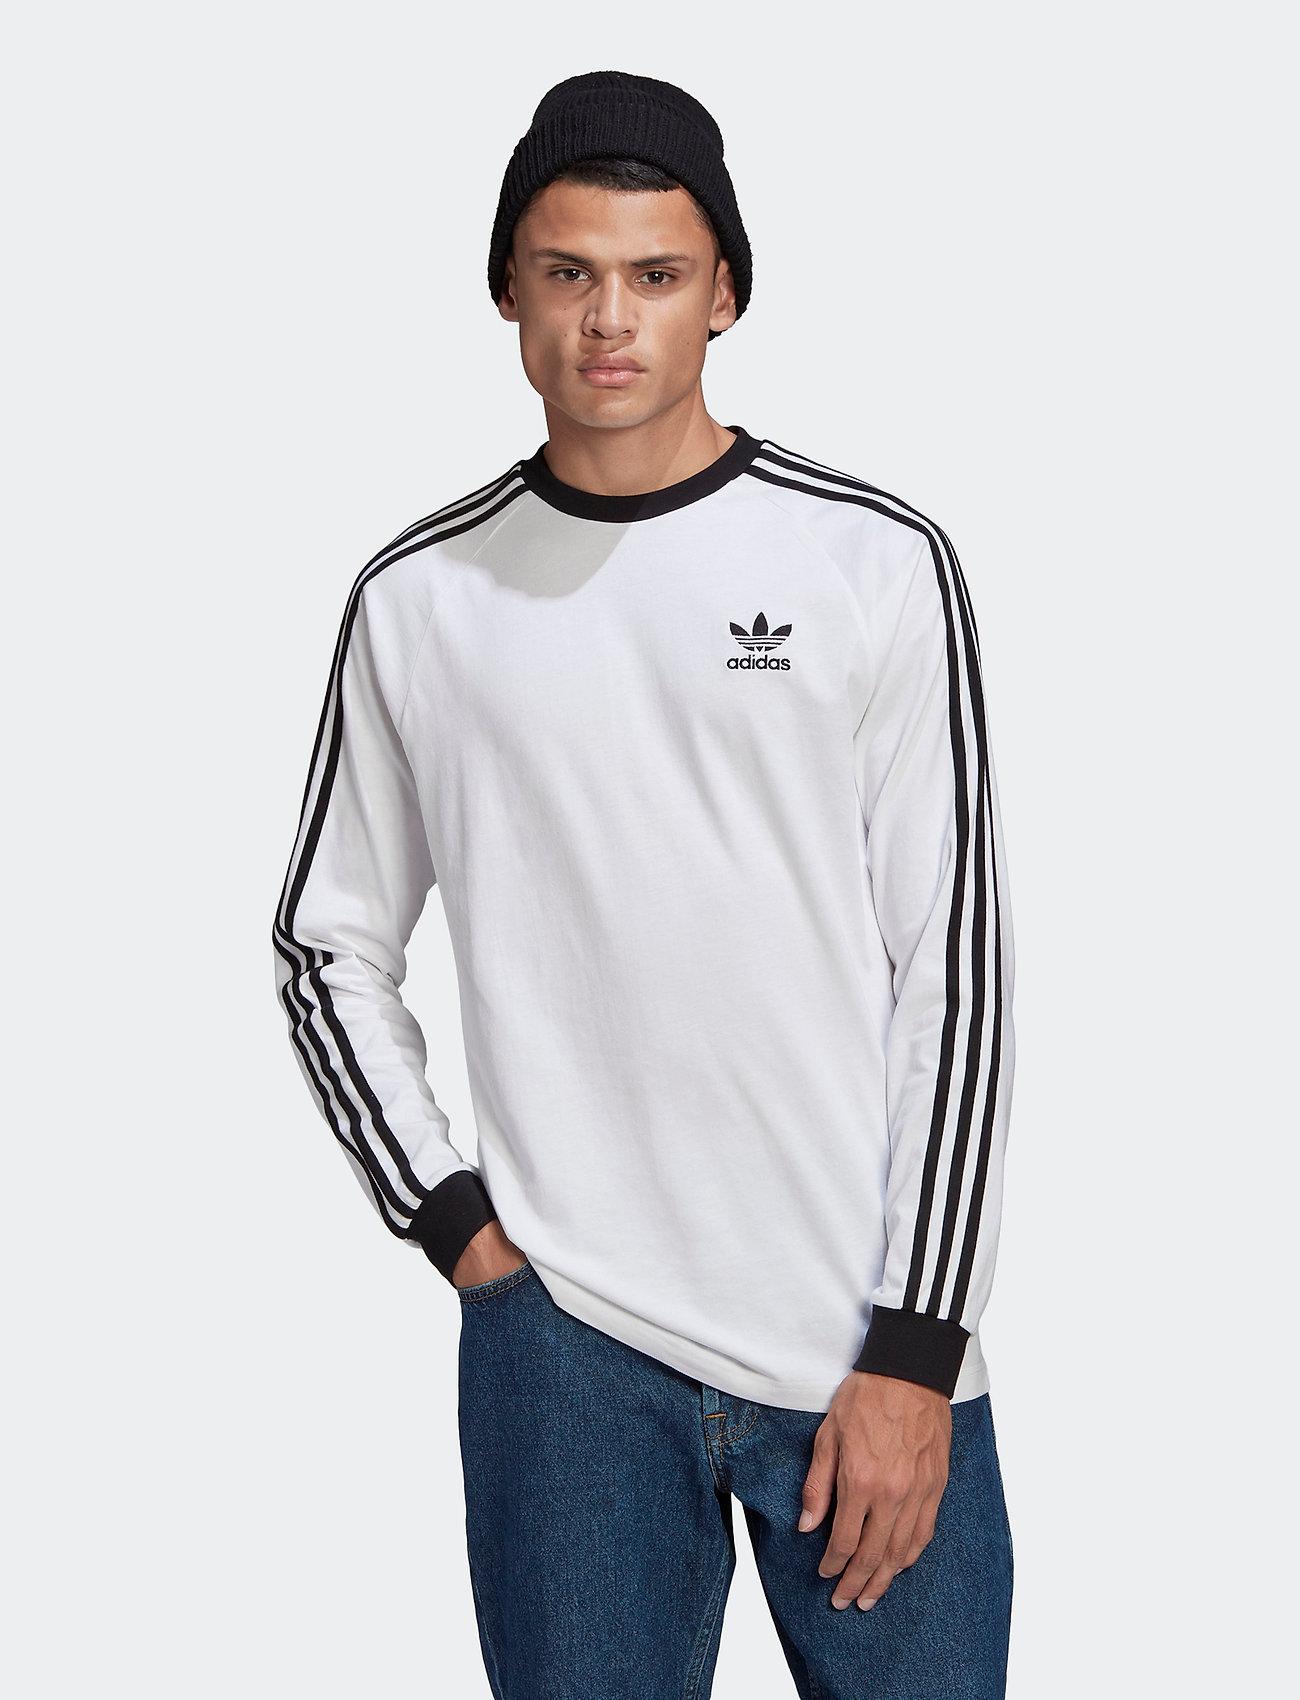 adidas Originals - Adicolor Classics 3-Stripes Long Sleeve T-Shirt - langermede topper - white - 0